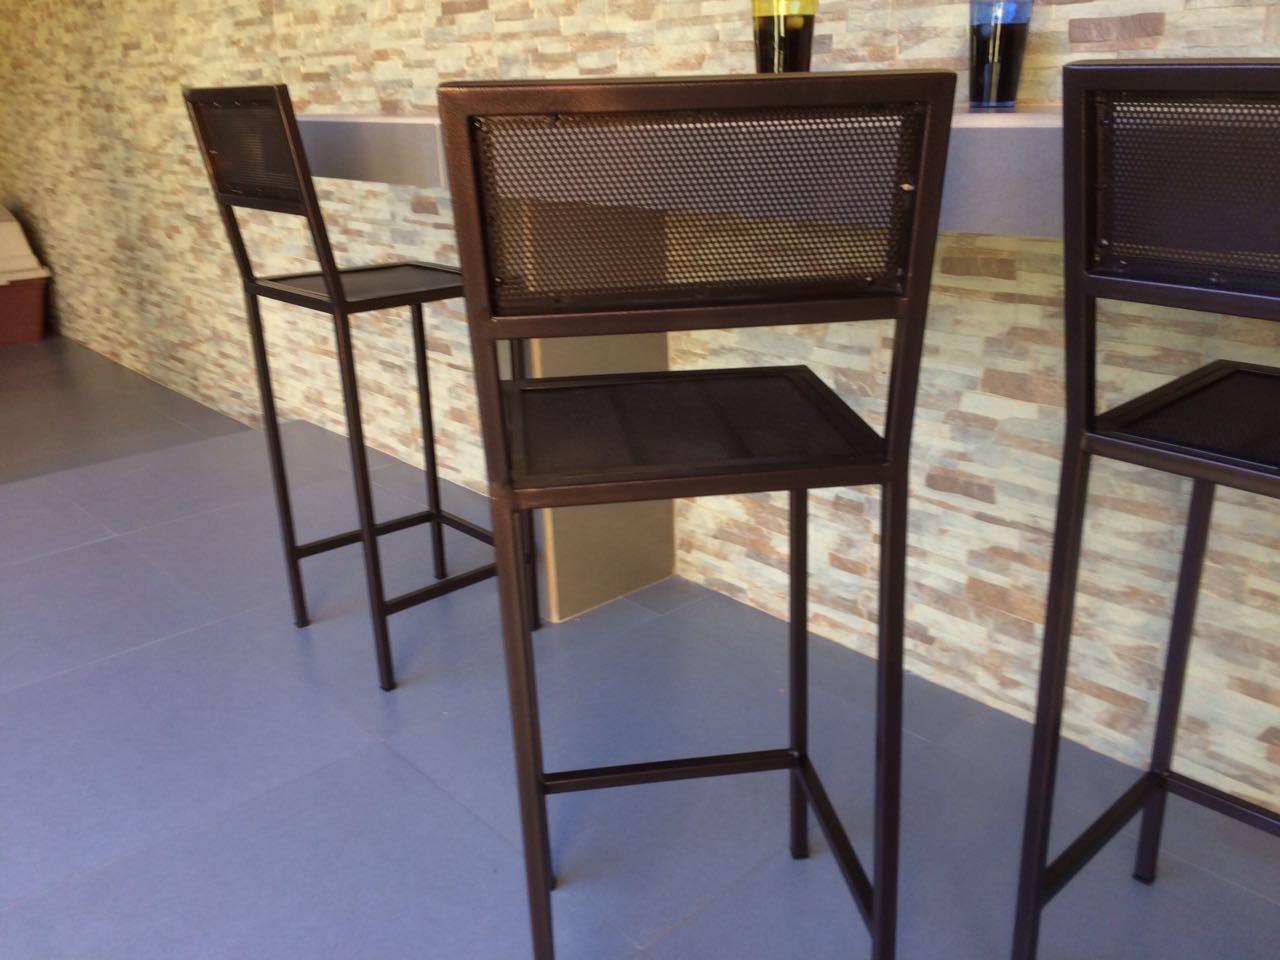 Pisos Bar Fierro Altamente Resistente Rusti Home